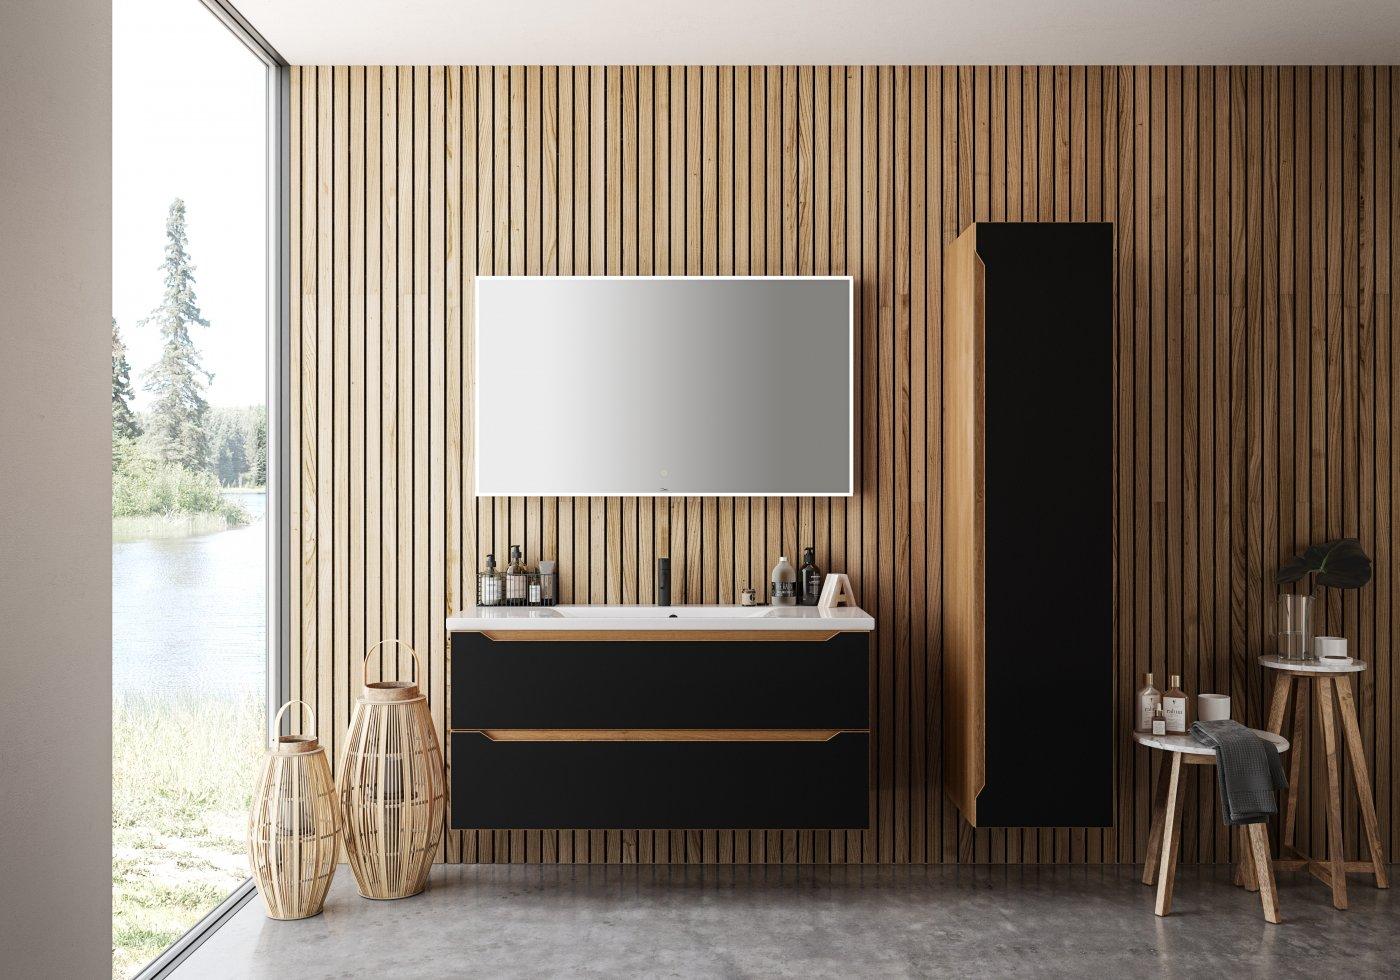 baderom i eik svartmalt med firkantet speil og servantmøbel